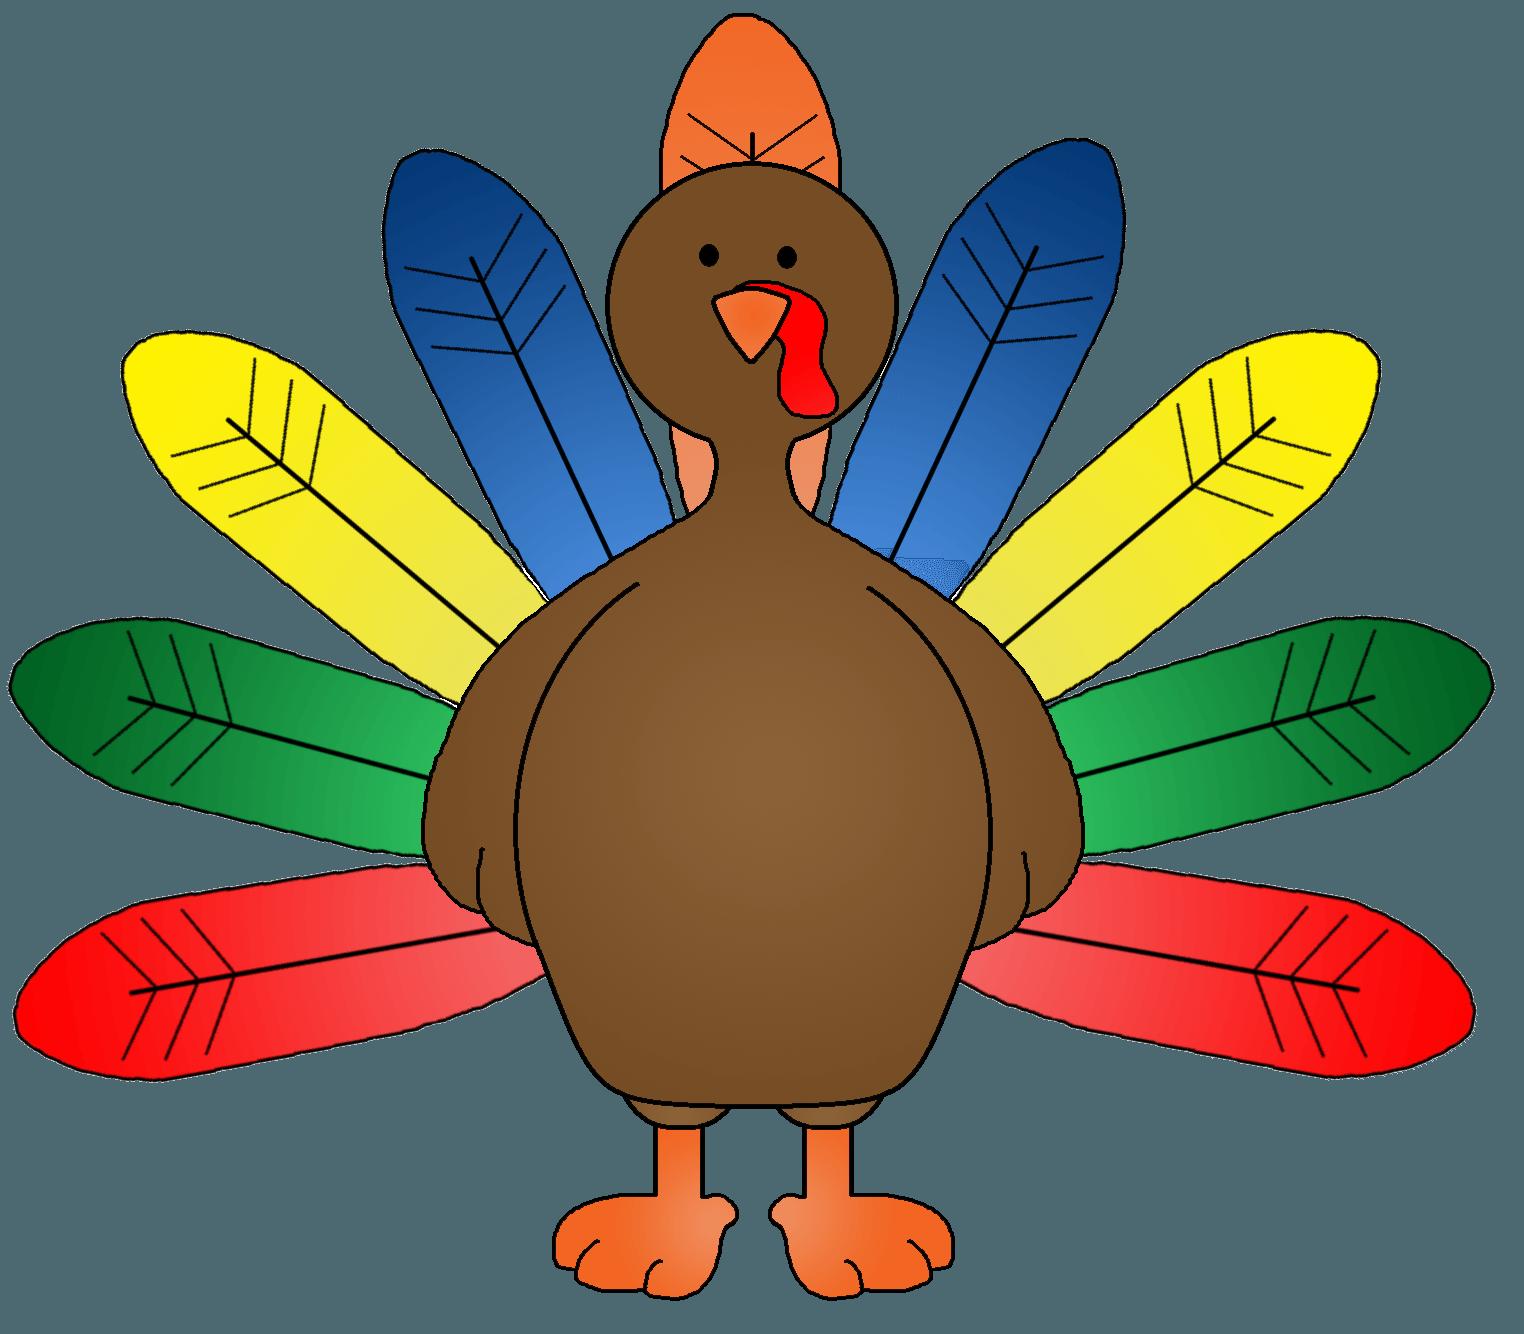 external image thanksgiving-turkey-clip-art-4YvpTx-clipart.png